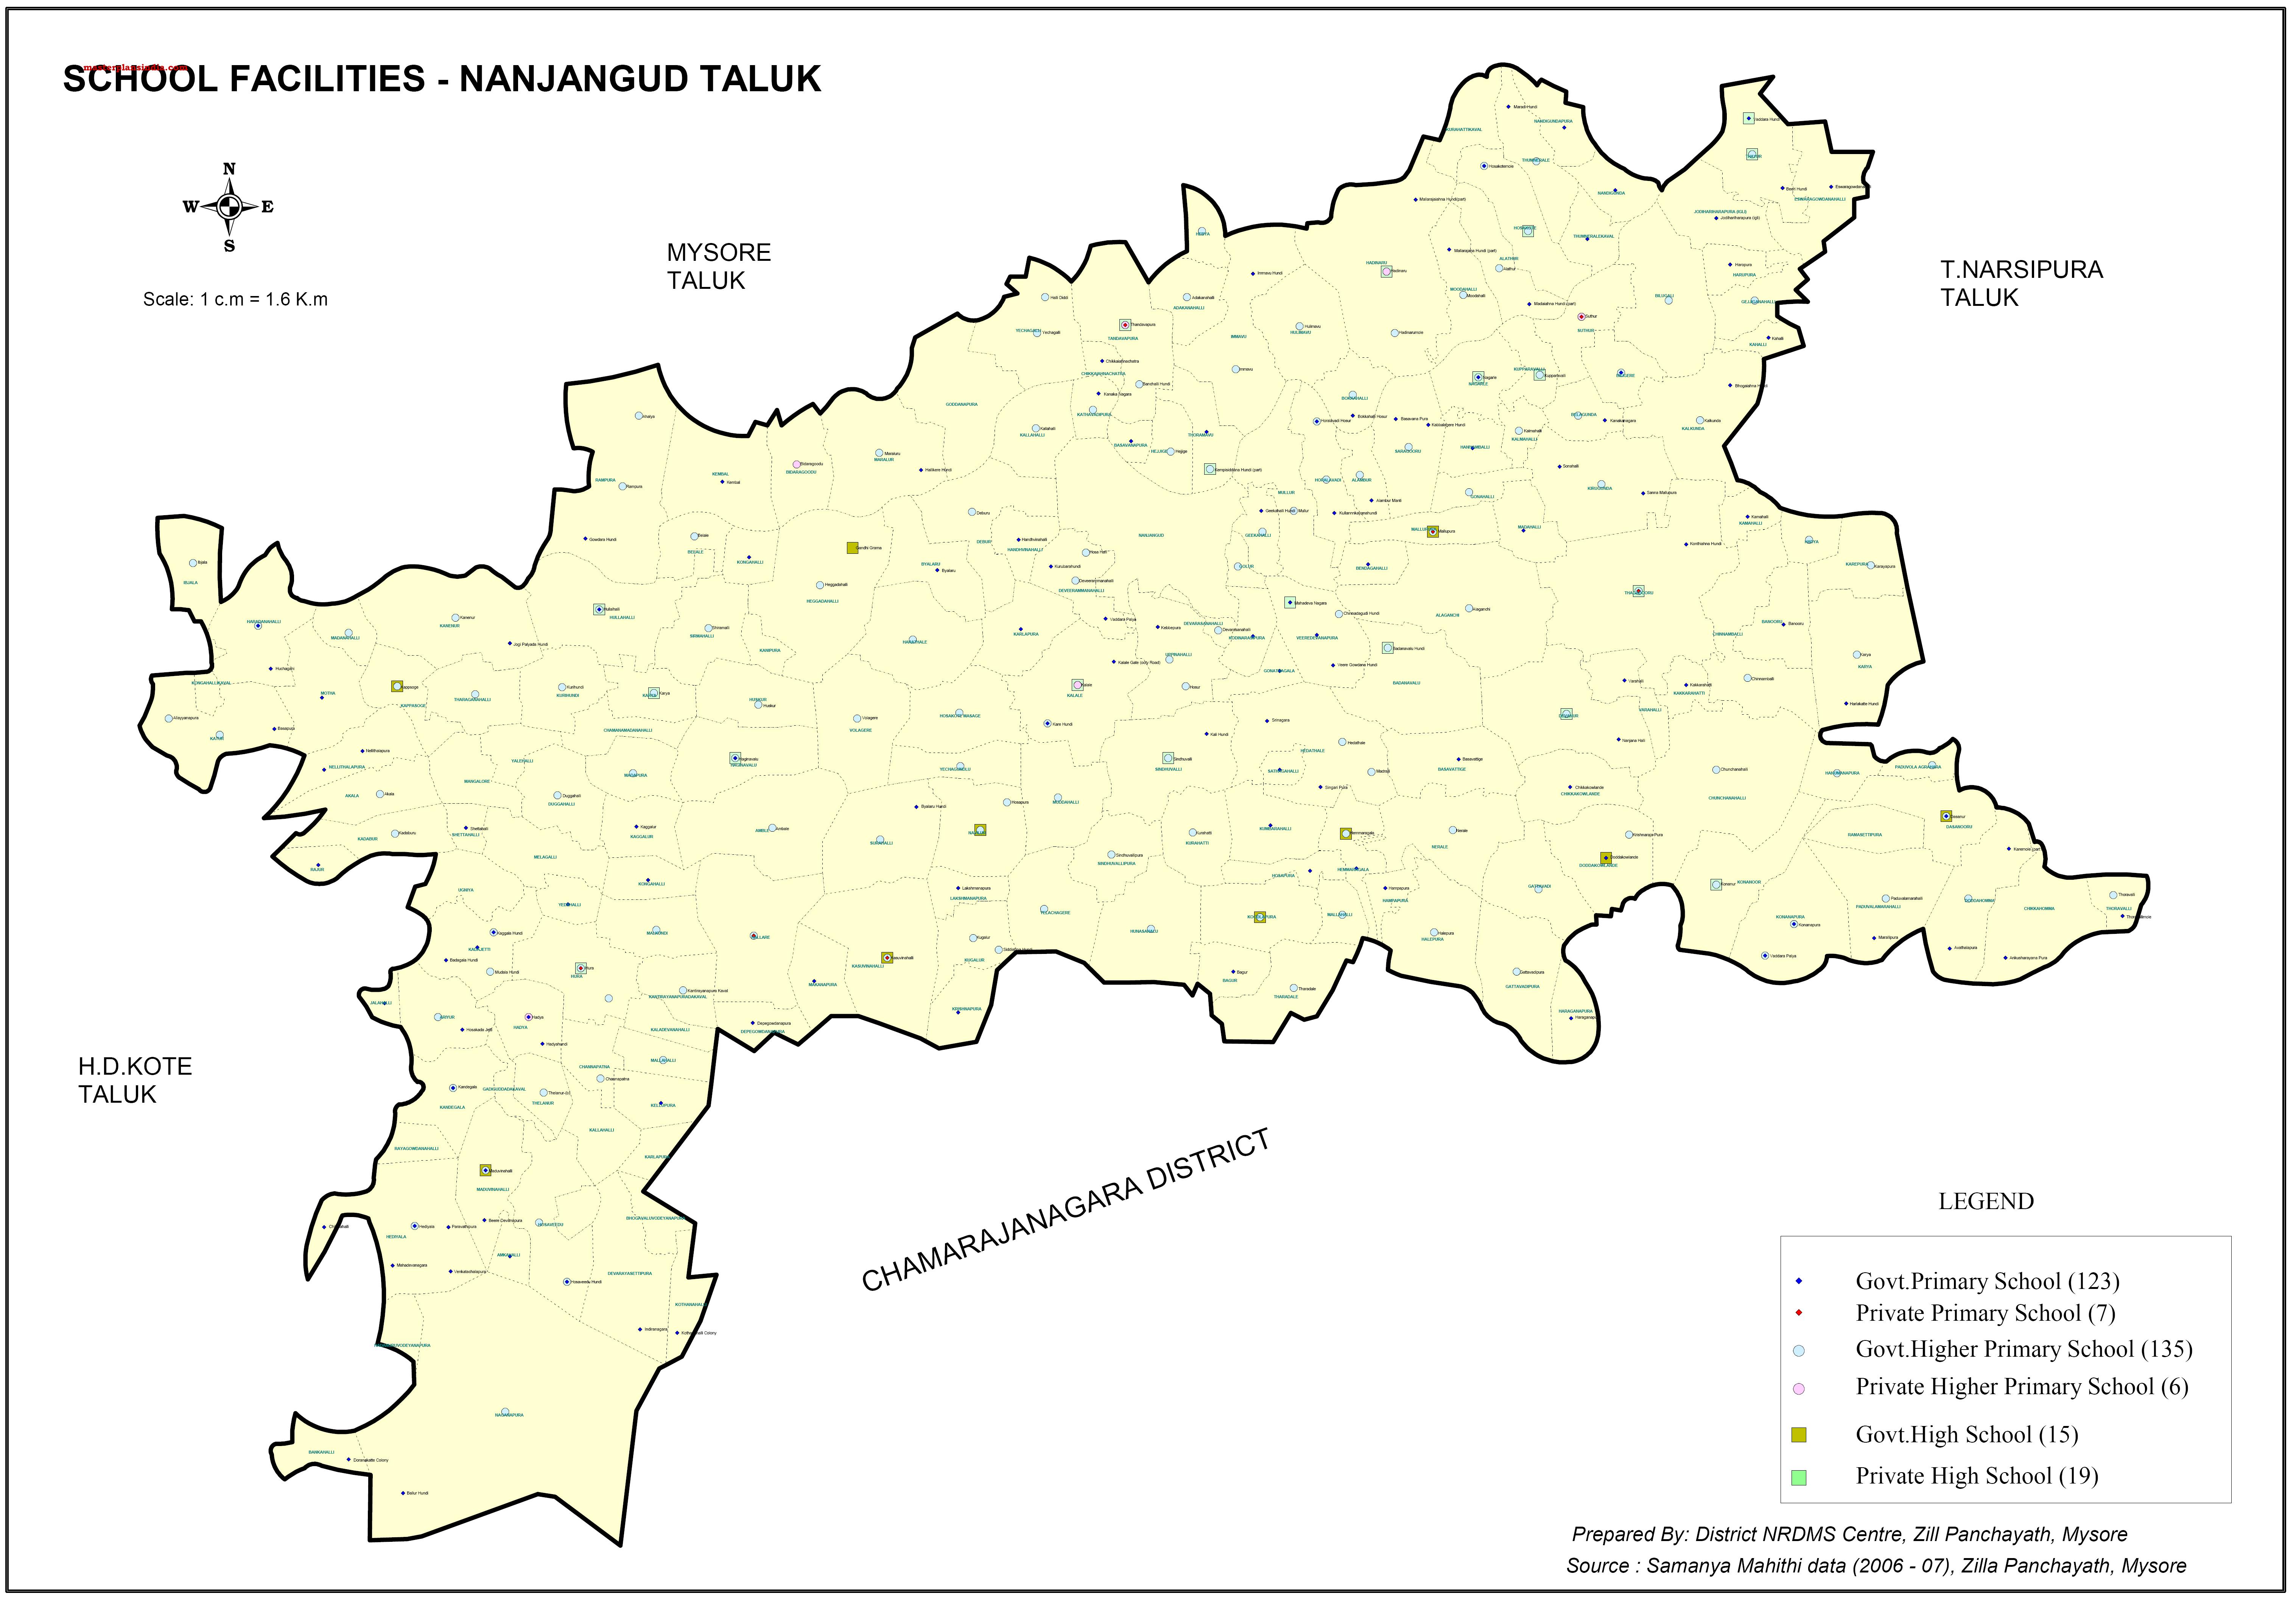 nanjagud-taluk--facilities-map Janani Suraksha Yojana Application Form Download on